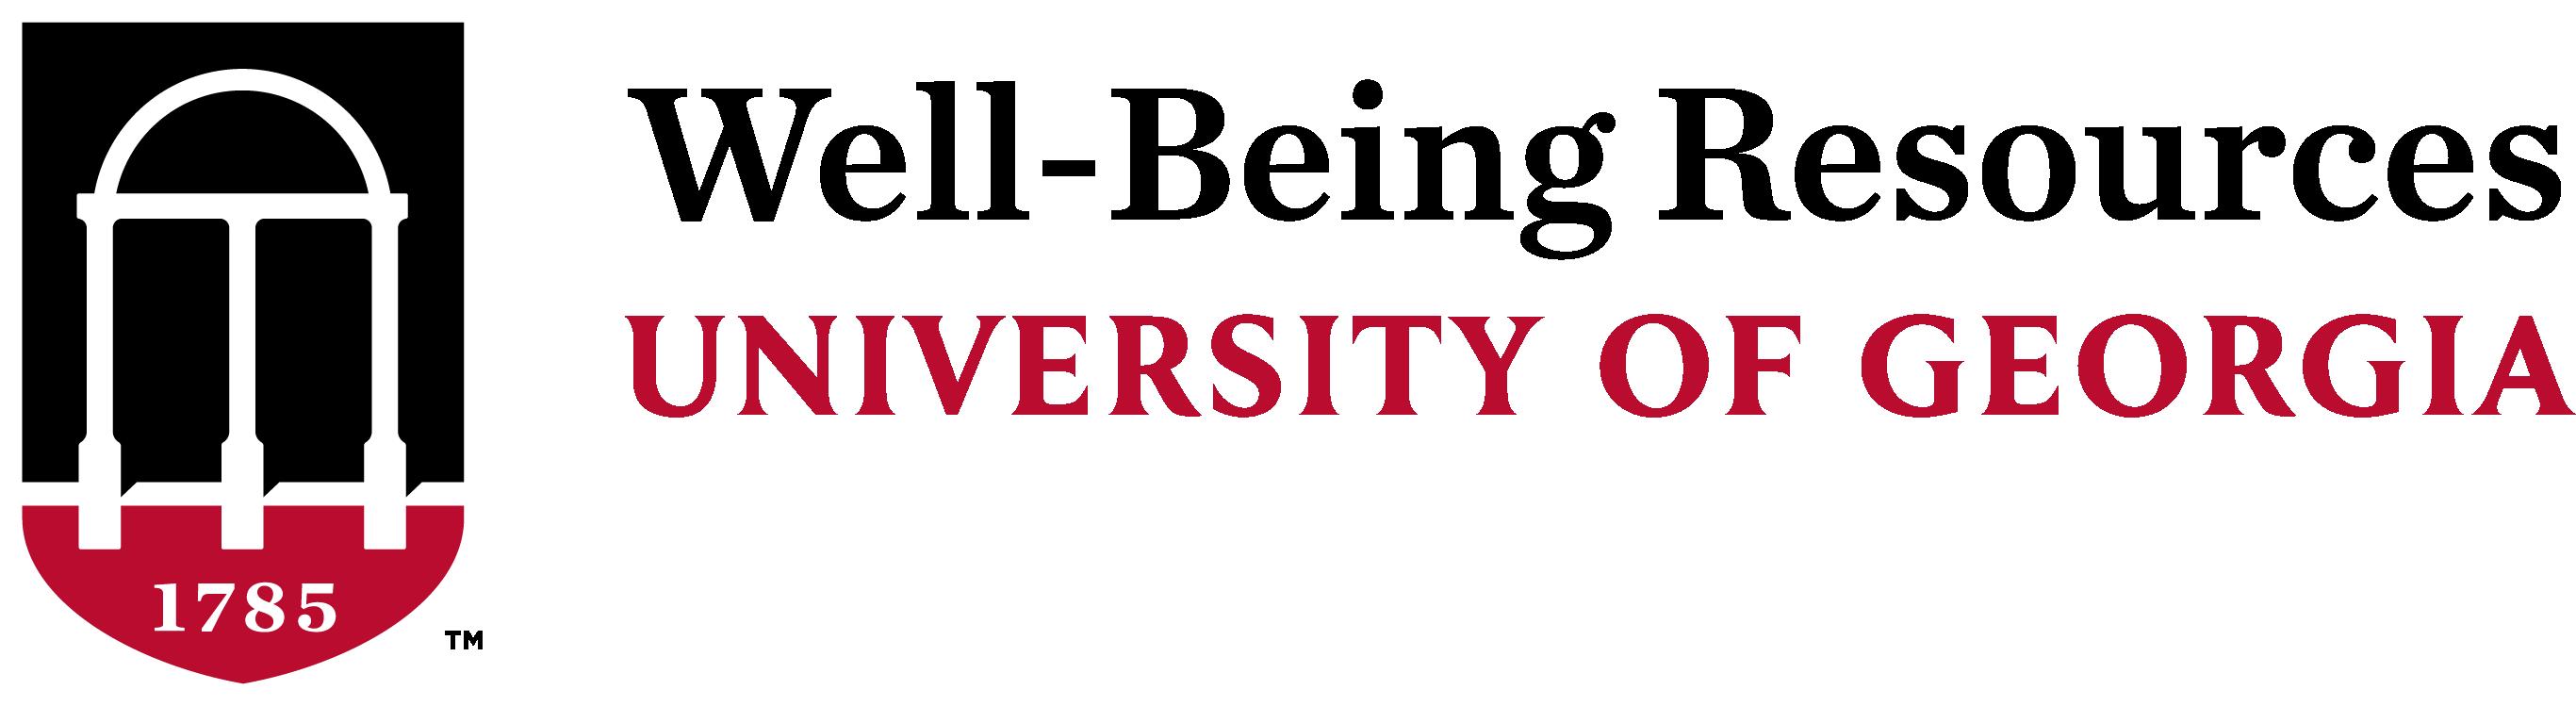 UGA Well-being Resources Logo